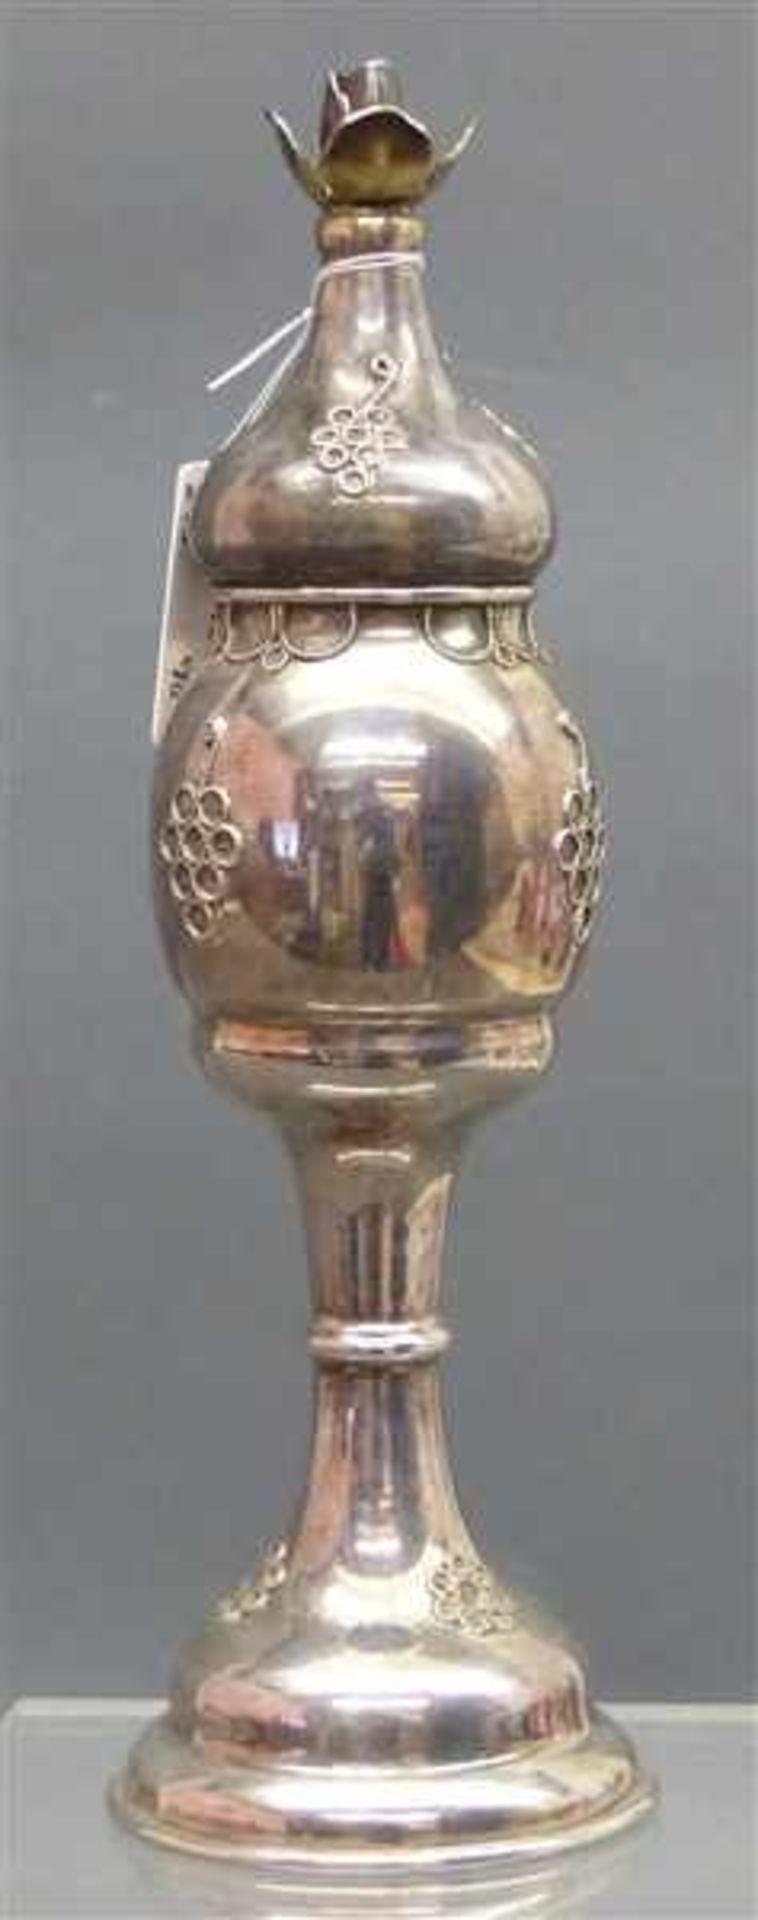 Deckelpokal Sterlingsilber, Rosenmotiv, h 19 cm, punziert, 82 g schwer,